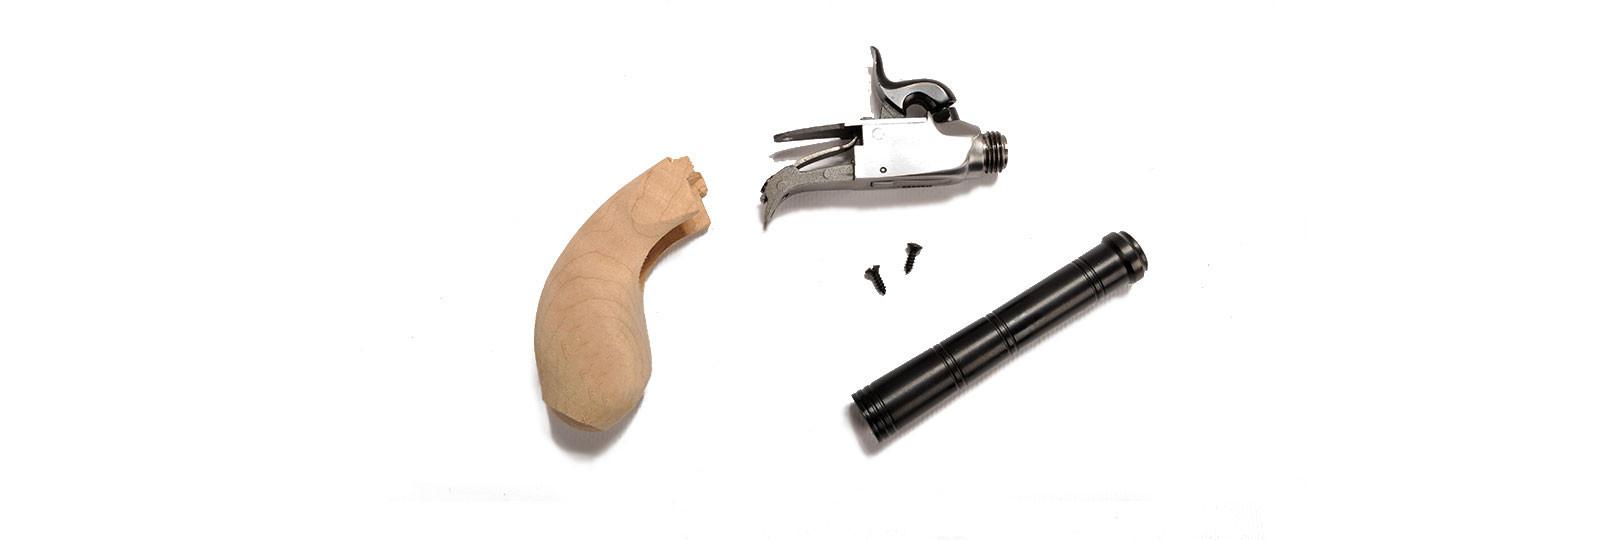 Derringer Liegi Pocket Kit